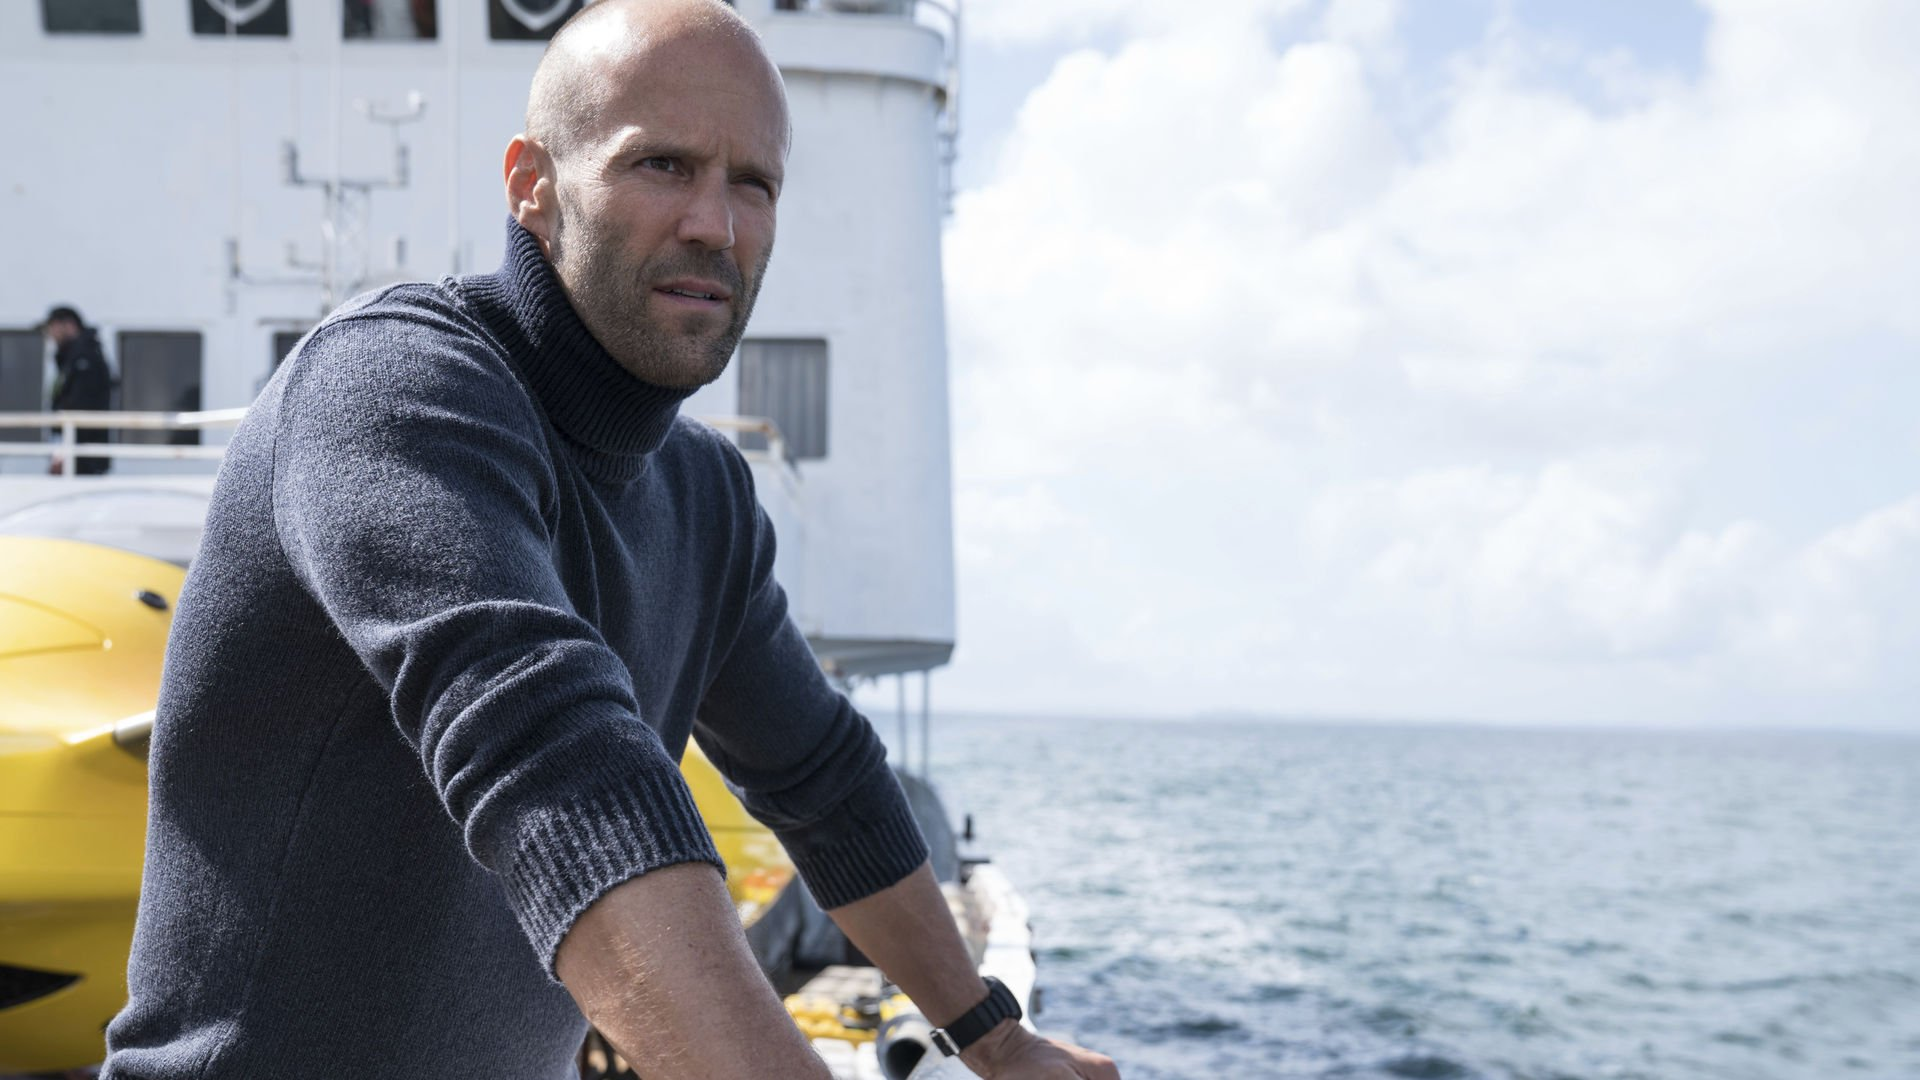 Jason Statham Antalya'da film çekecek   Kültür-Sanat Haberleri